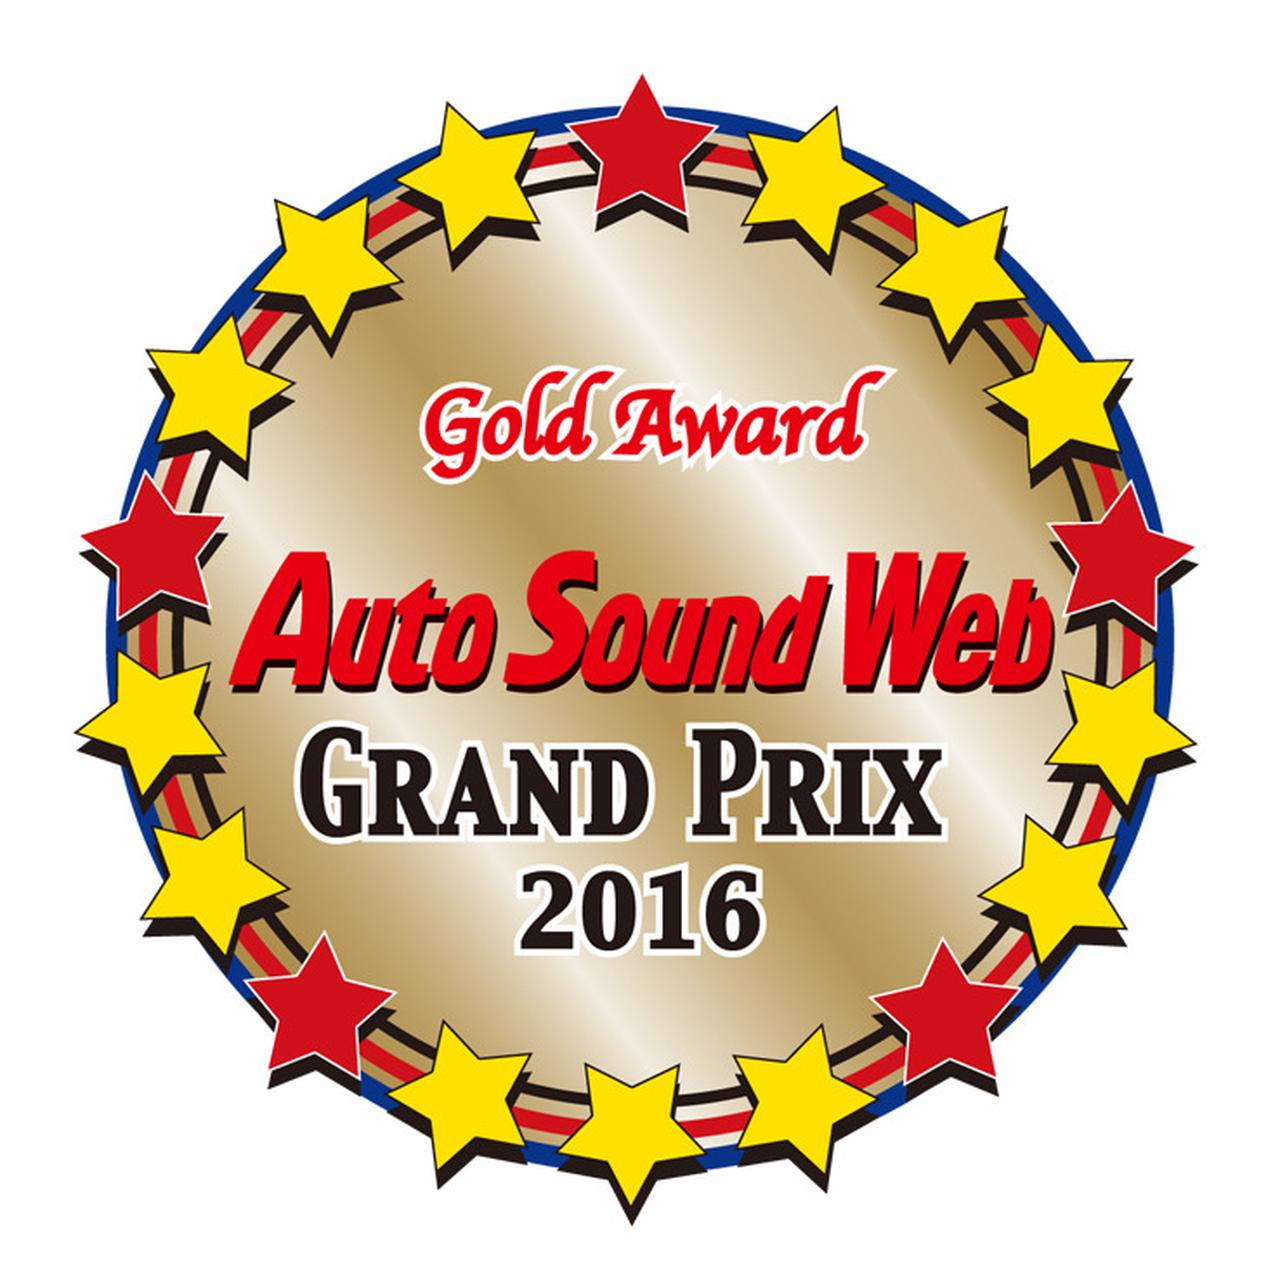 画像: Auto Sound Web Grand Prix 2016 受賞製品一覧 | Stereo Sound ONLINE